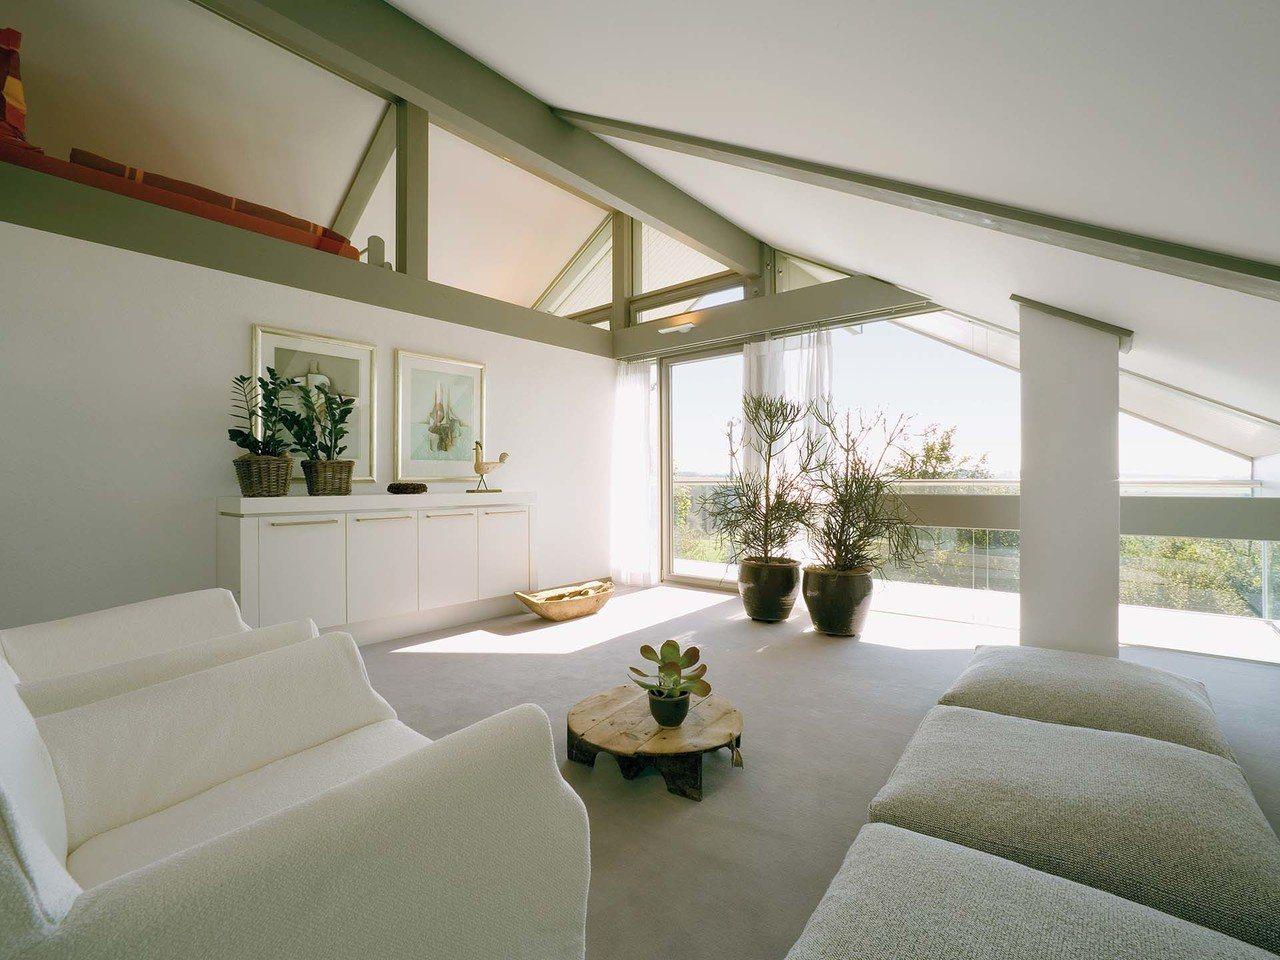 Musterhaus HUF Haus ART 3 - OG